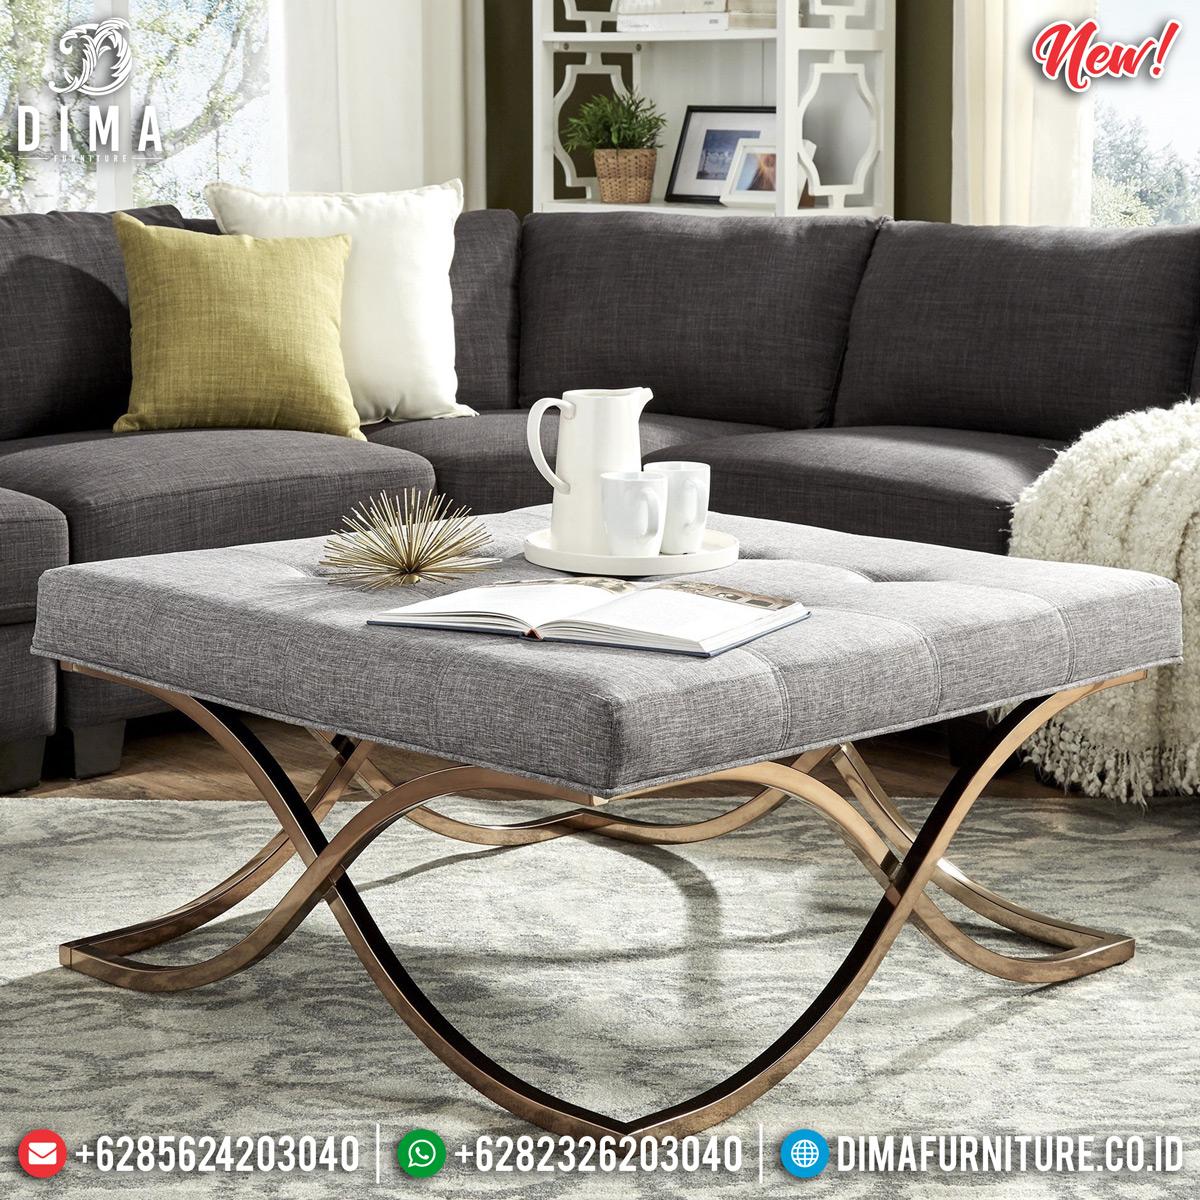 Meja Tamu Minimalis Modern, Coffe Table Luxury Beautiful Design TTJ-0829